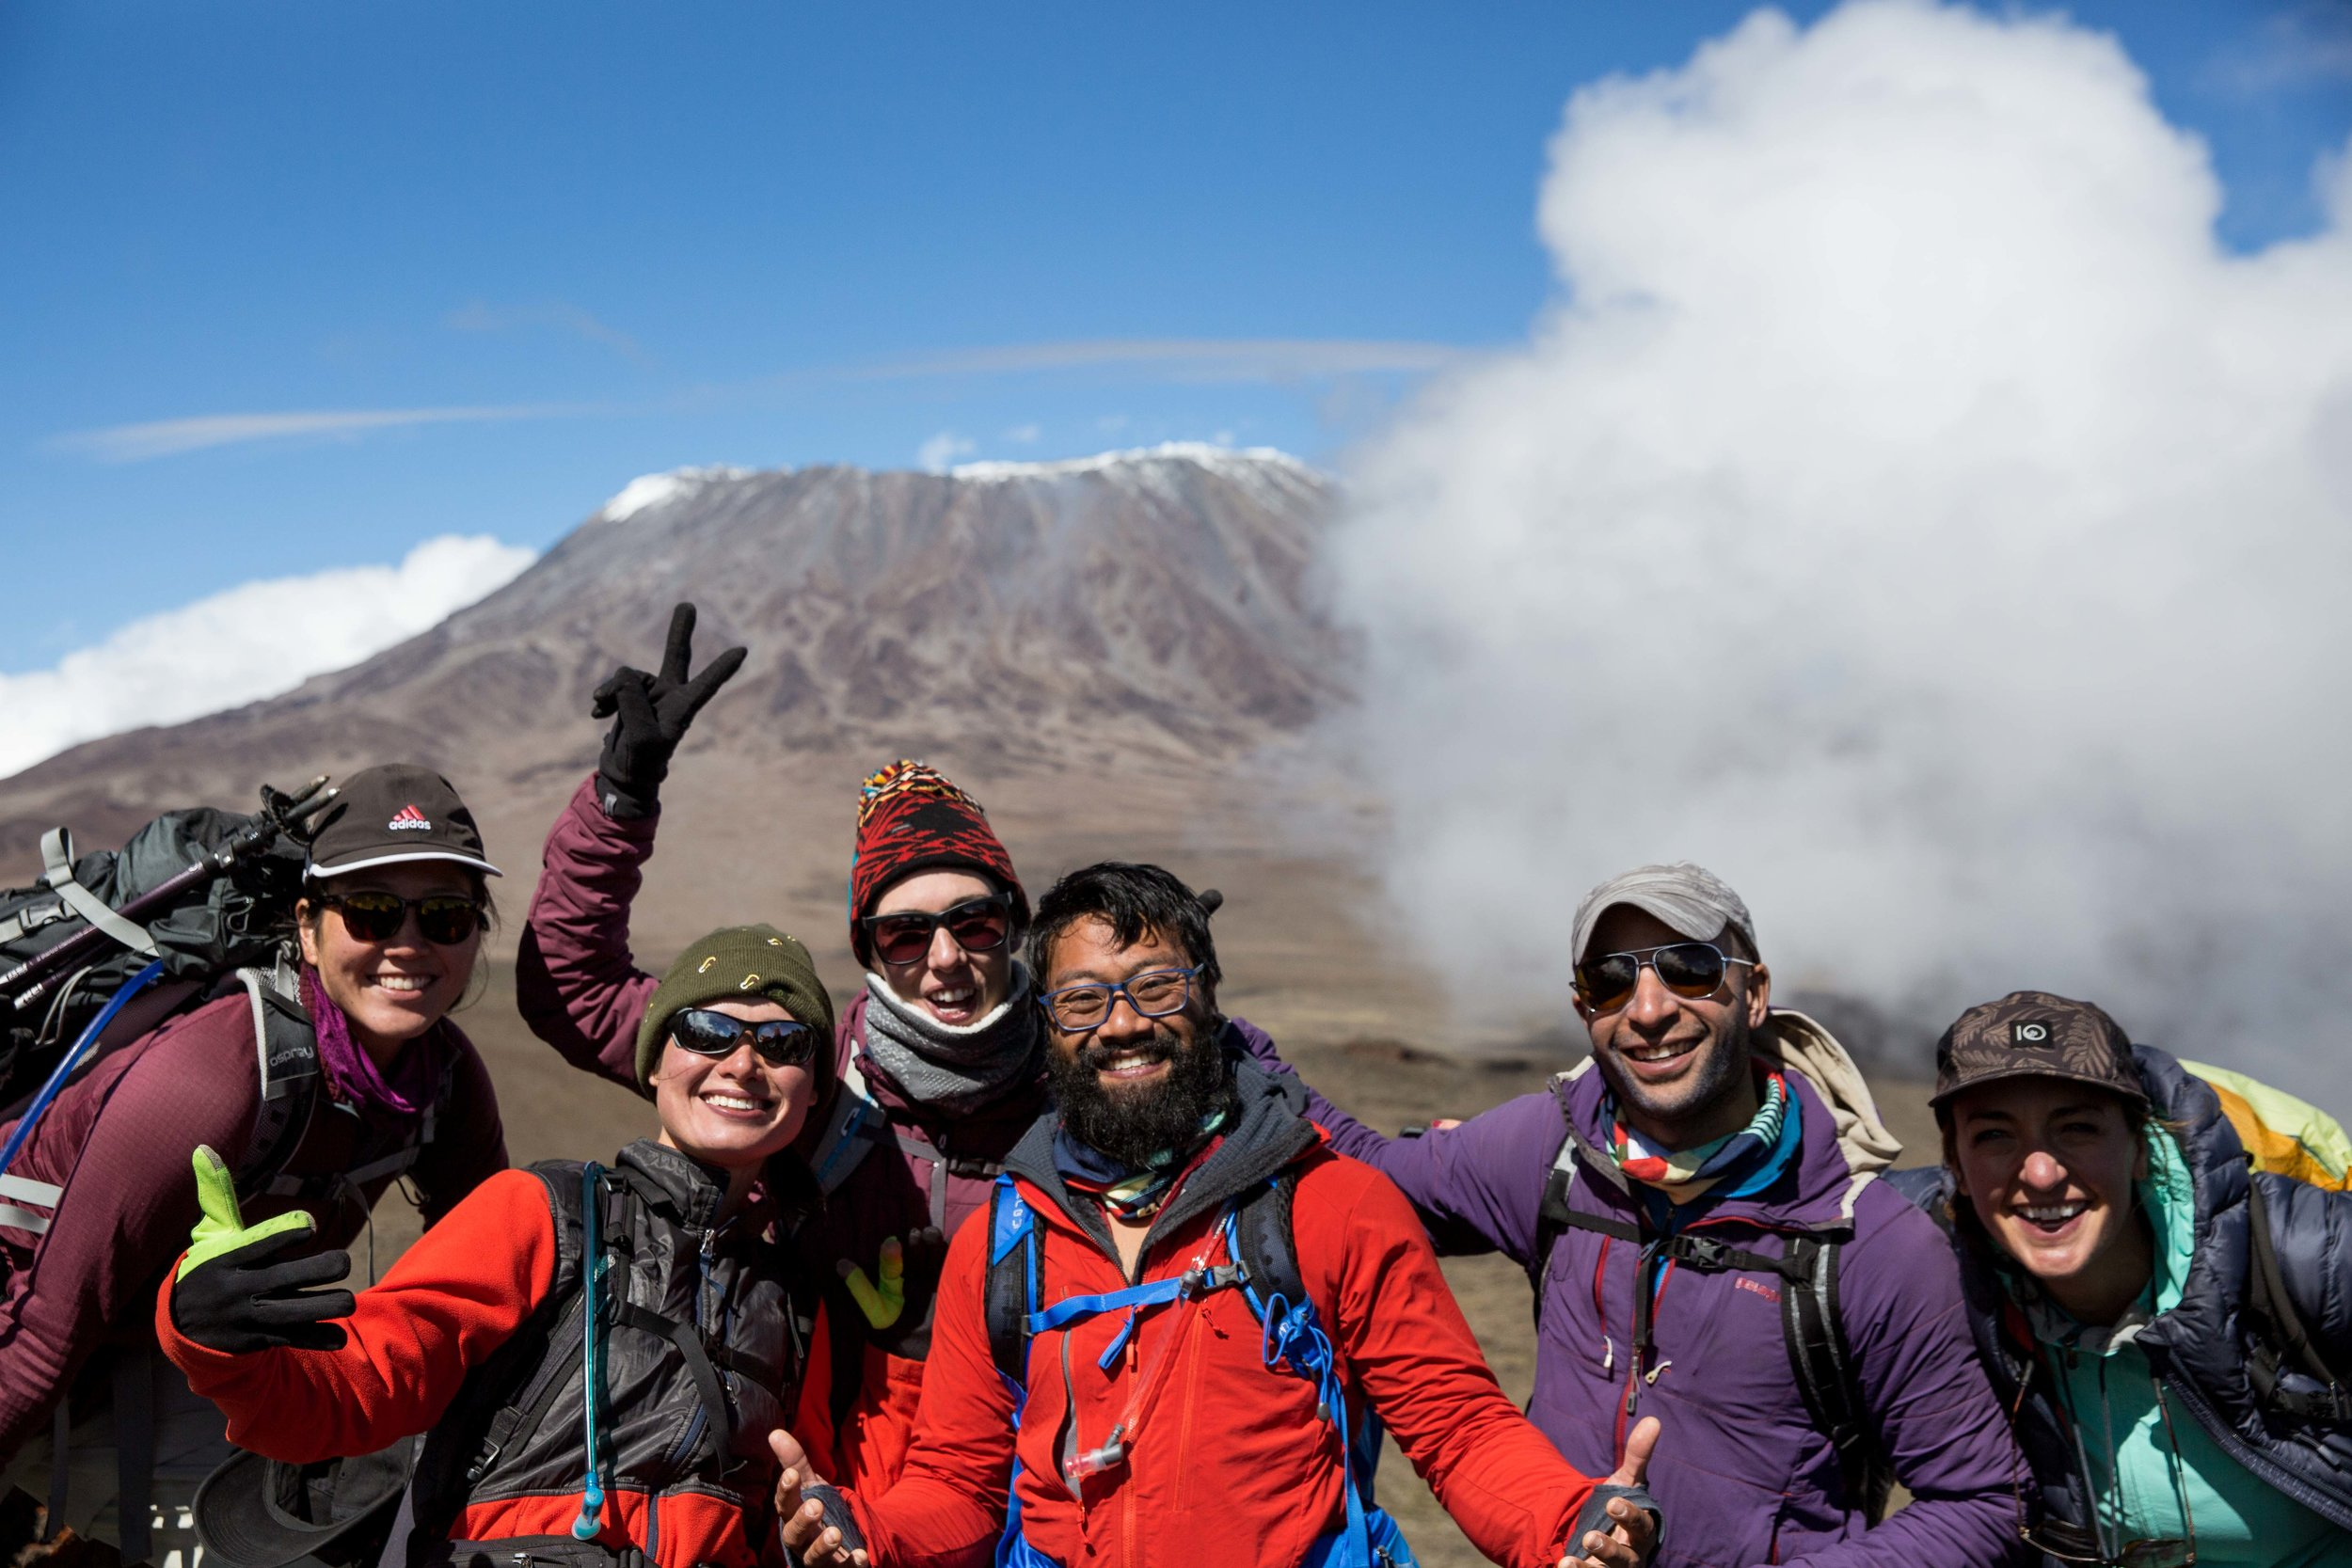 ajw_REI_Kilimanjaro-27.jpg